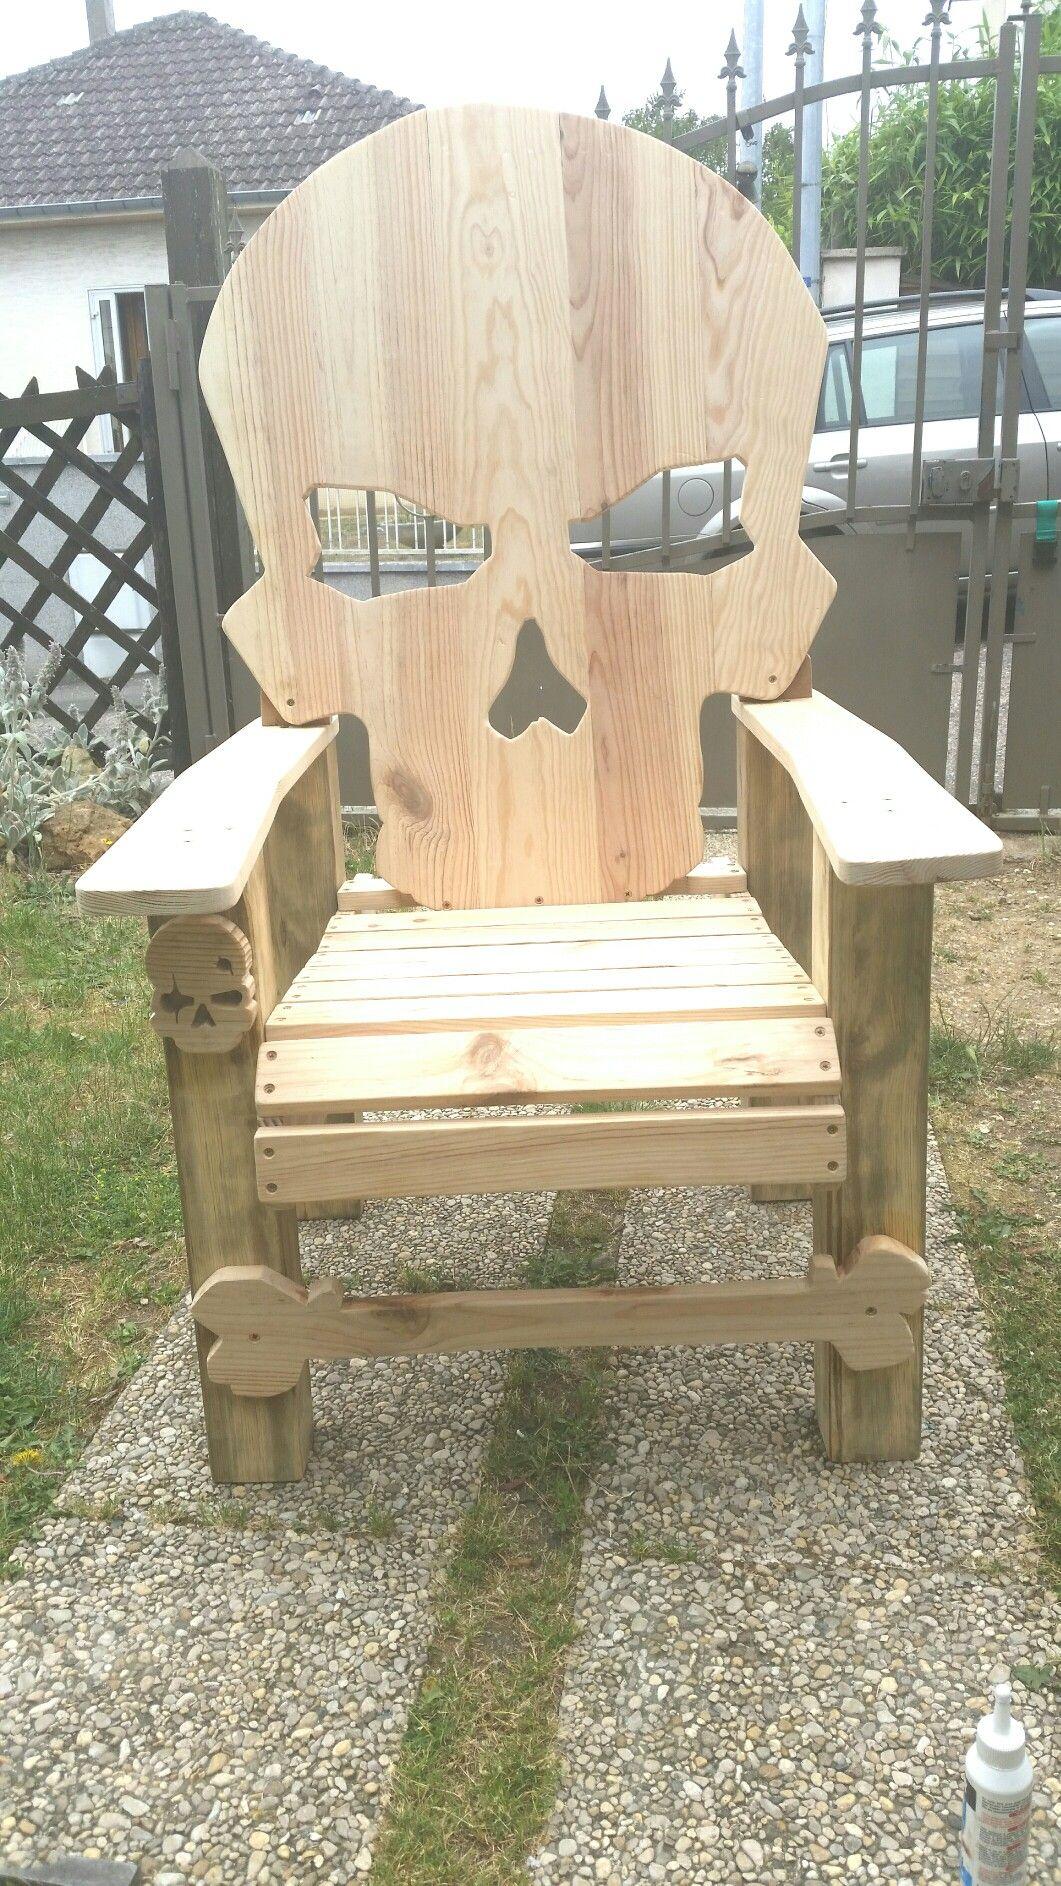 Etape 12 Adirondack Chair Skull Termine Diy Skull Fauteuil By R2eko Gp Creations En Bois Diy Meuble Fauteuil